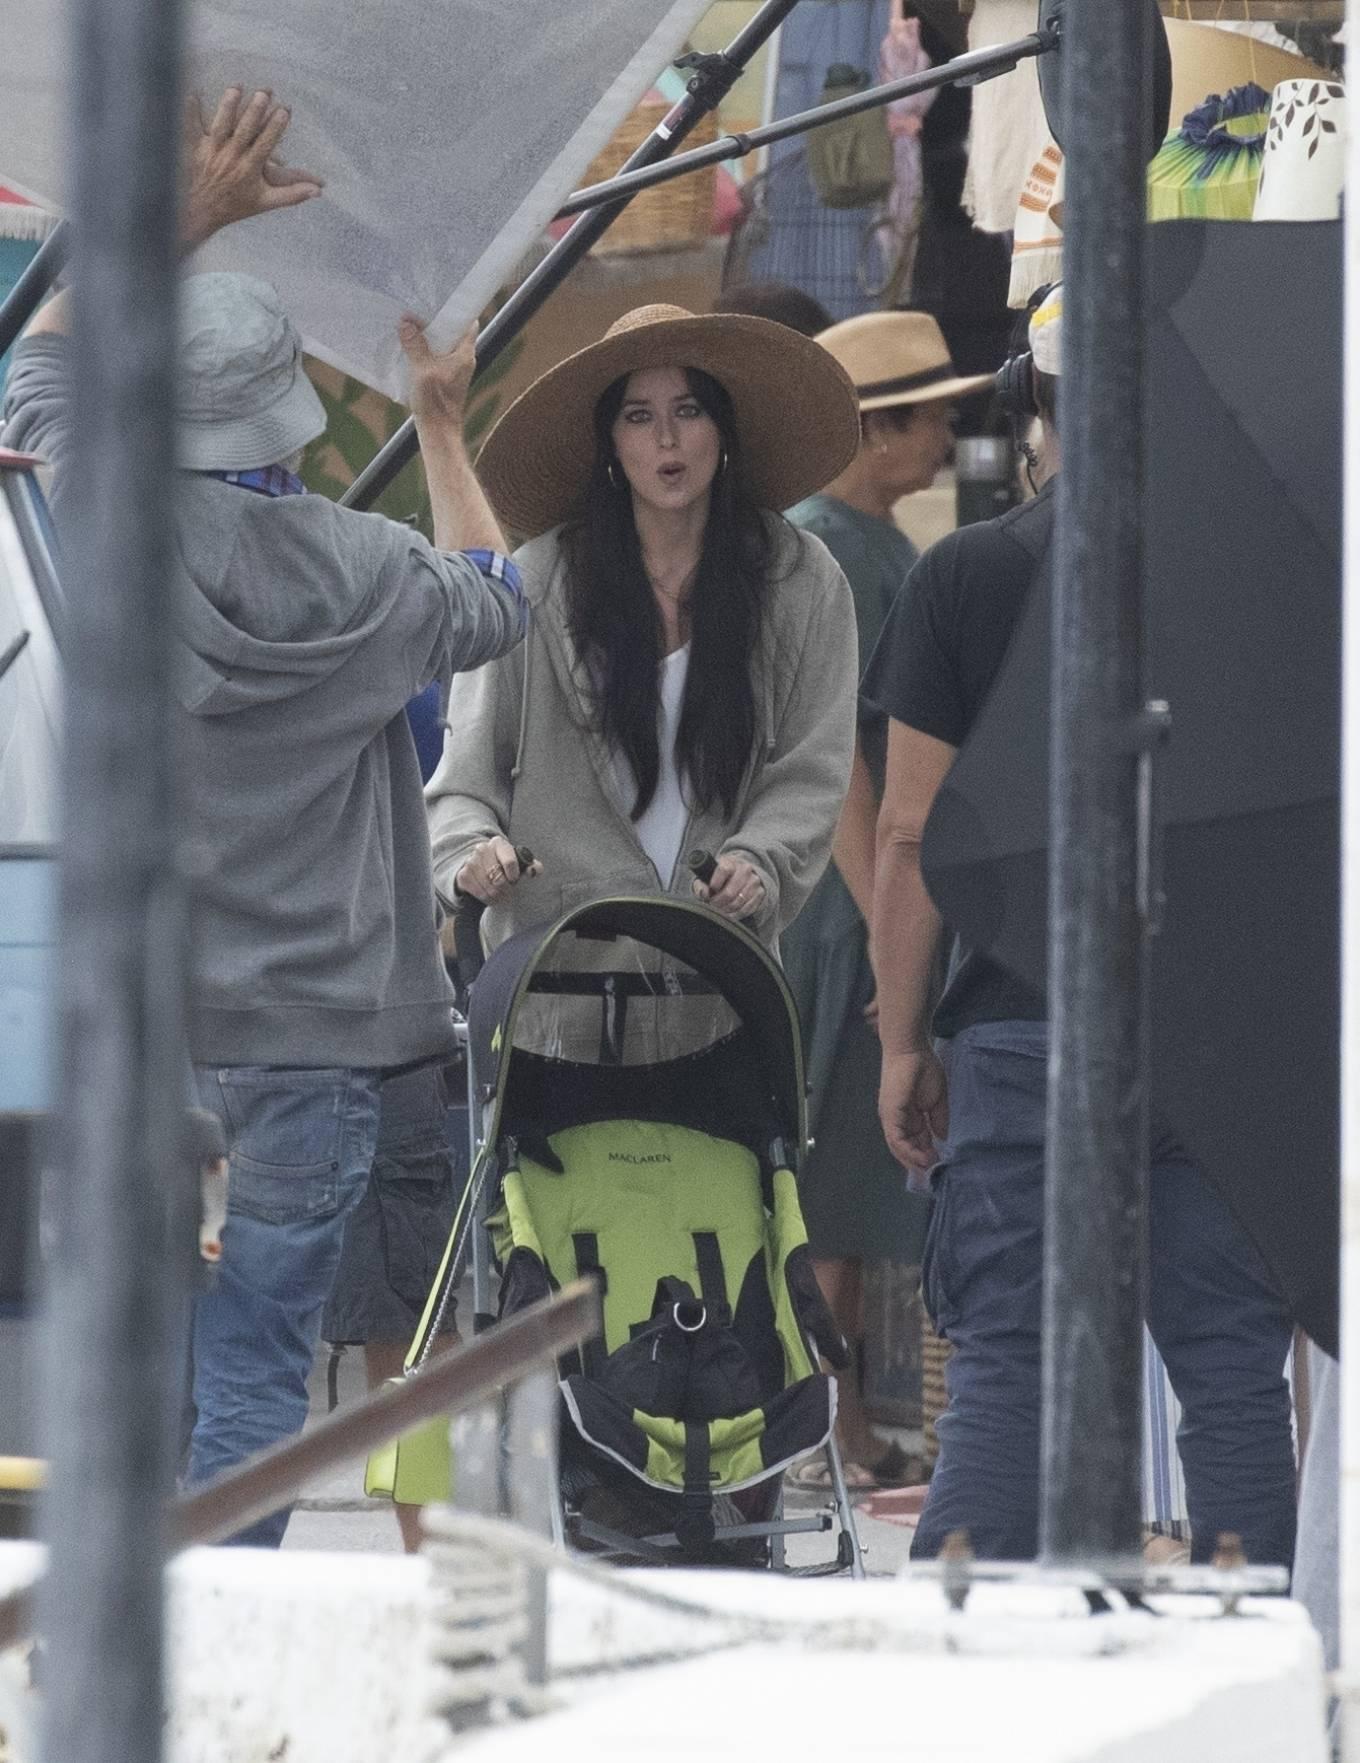 Dakota Johnson 2020 : Dakota Johnson – Filming The Lost Daughter in Speteses Island-03